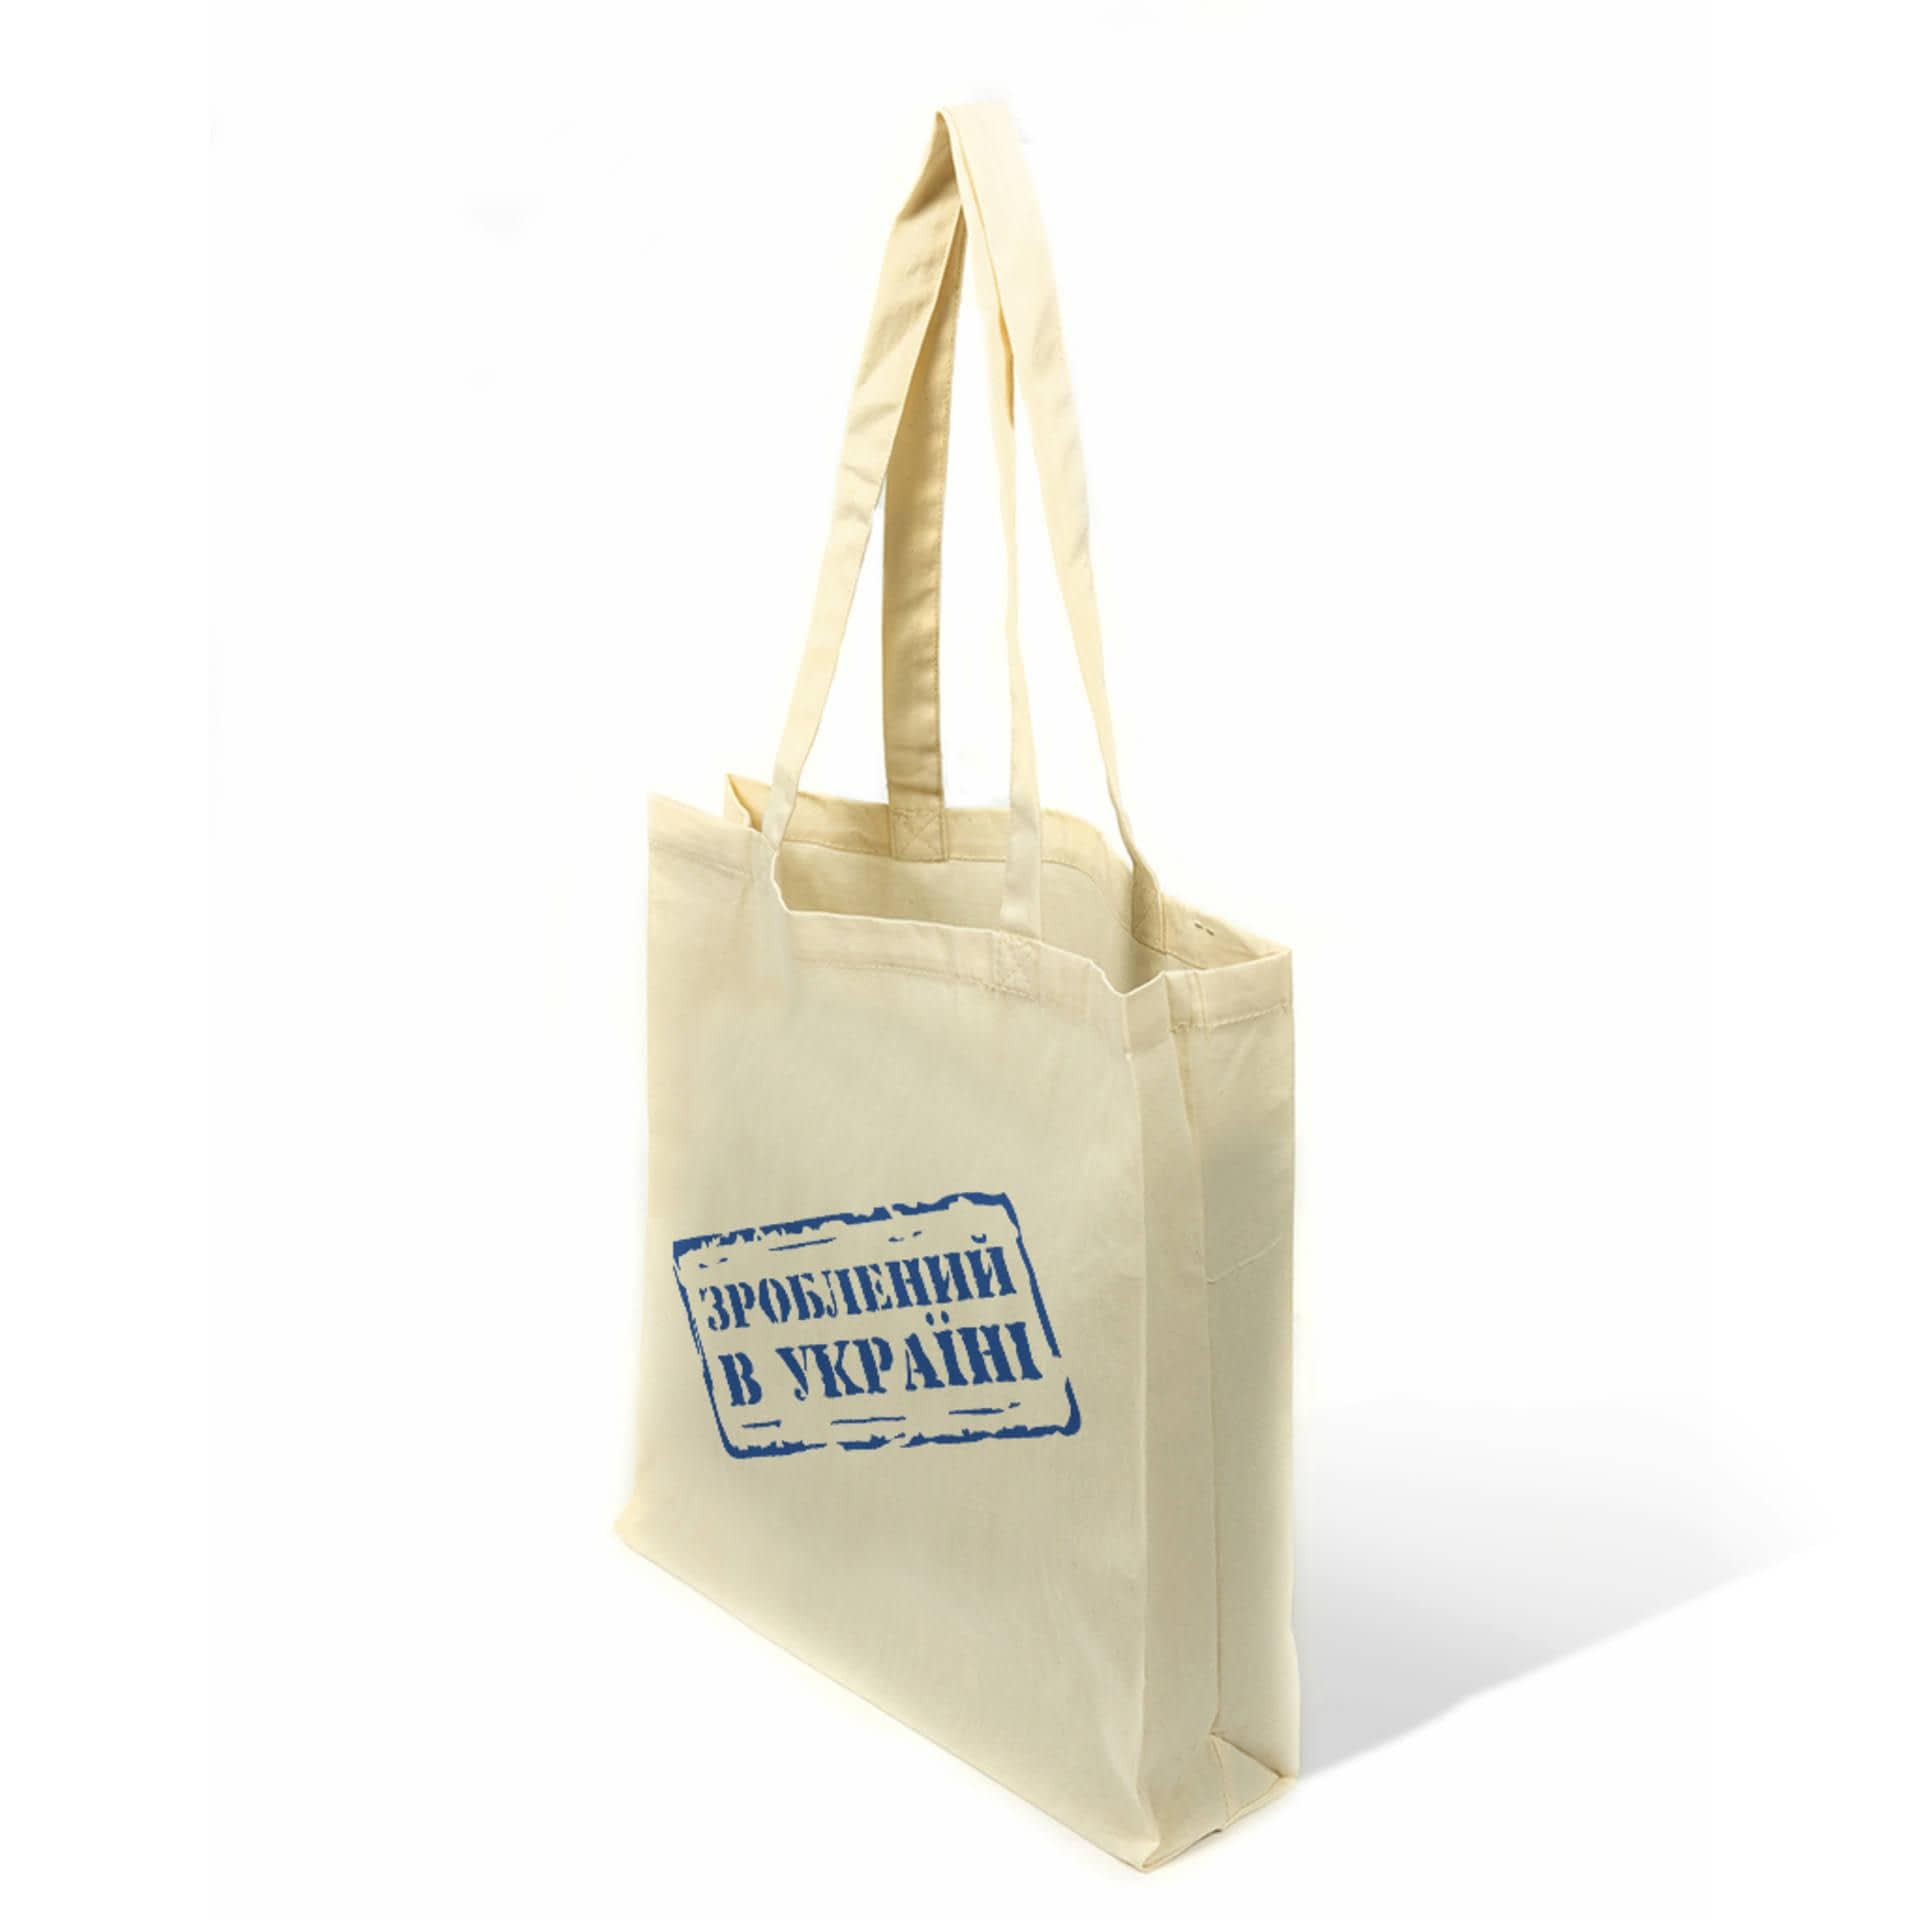 Тканини екосумка - Екосумка  бязь (ручка 70 см)